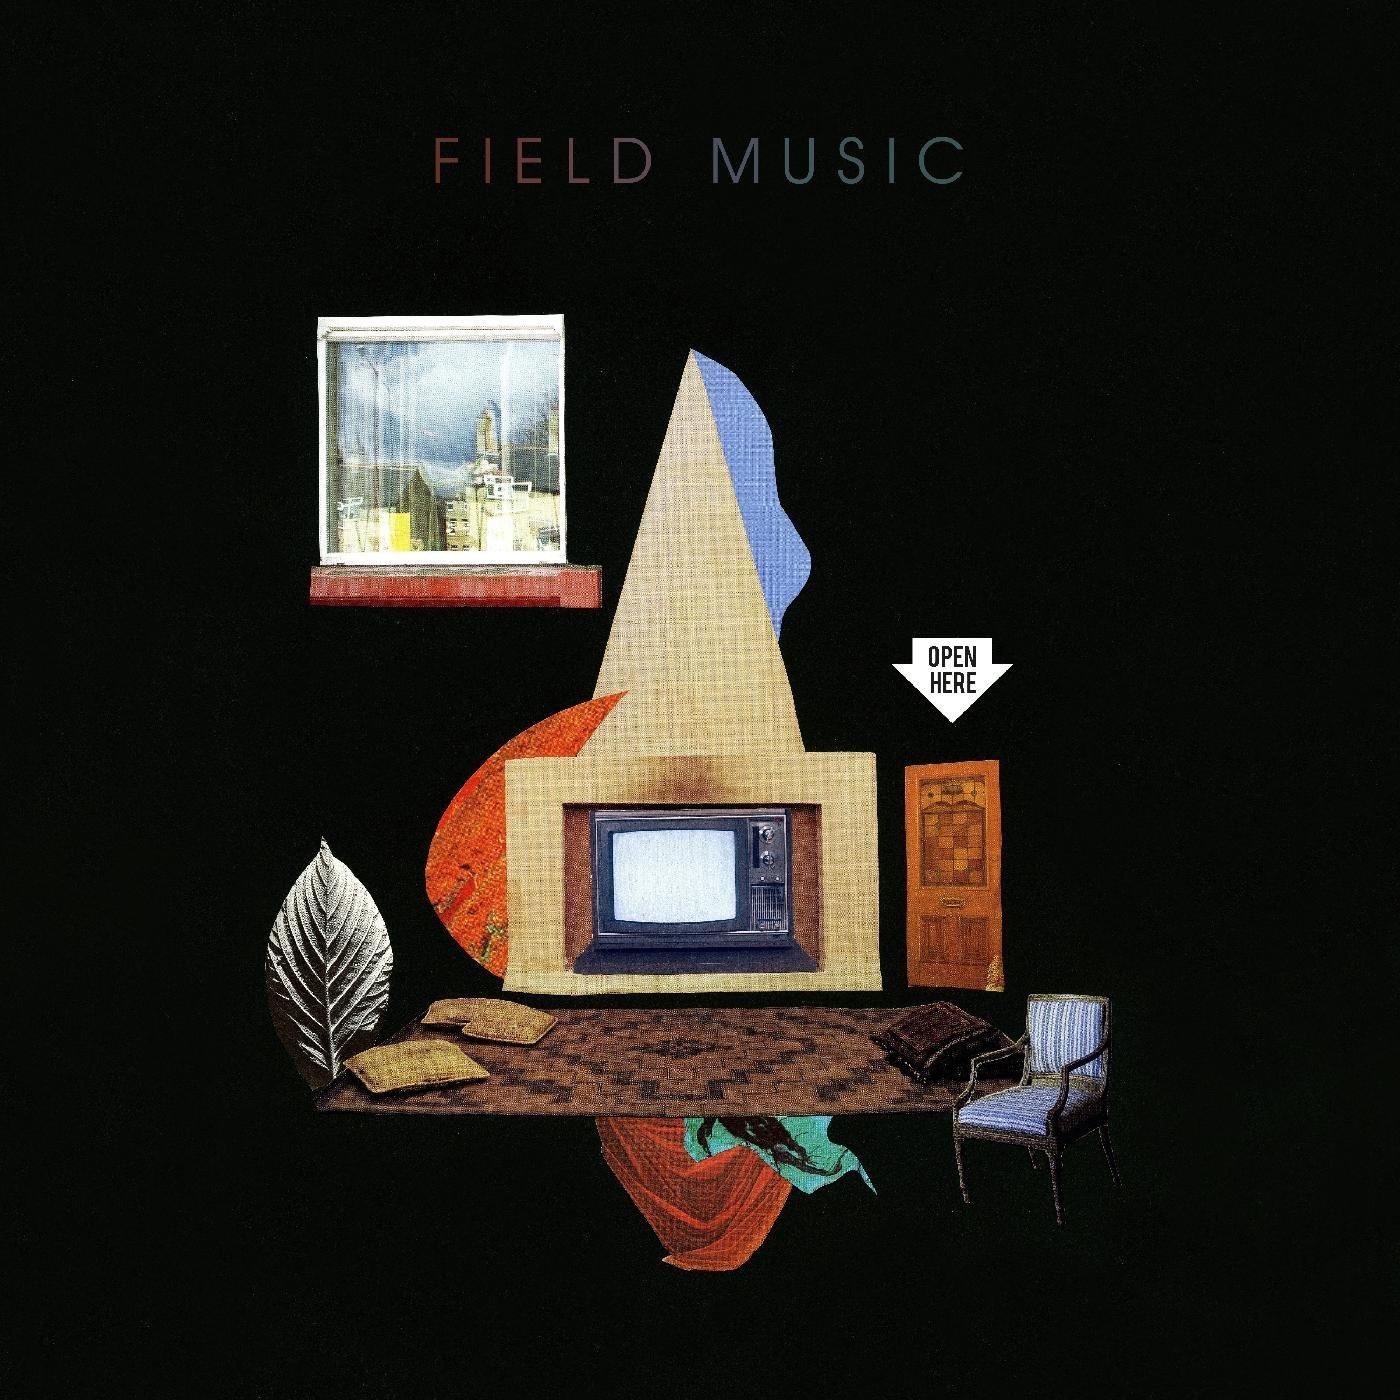 CD : Field Music - Open Here (CD)